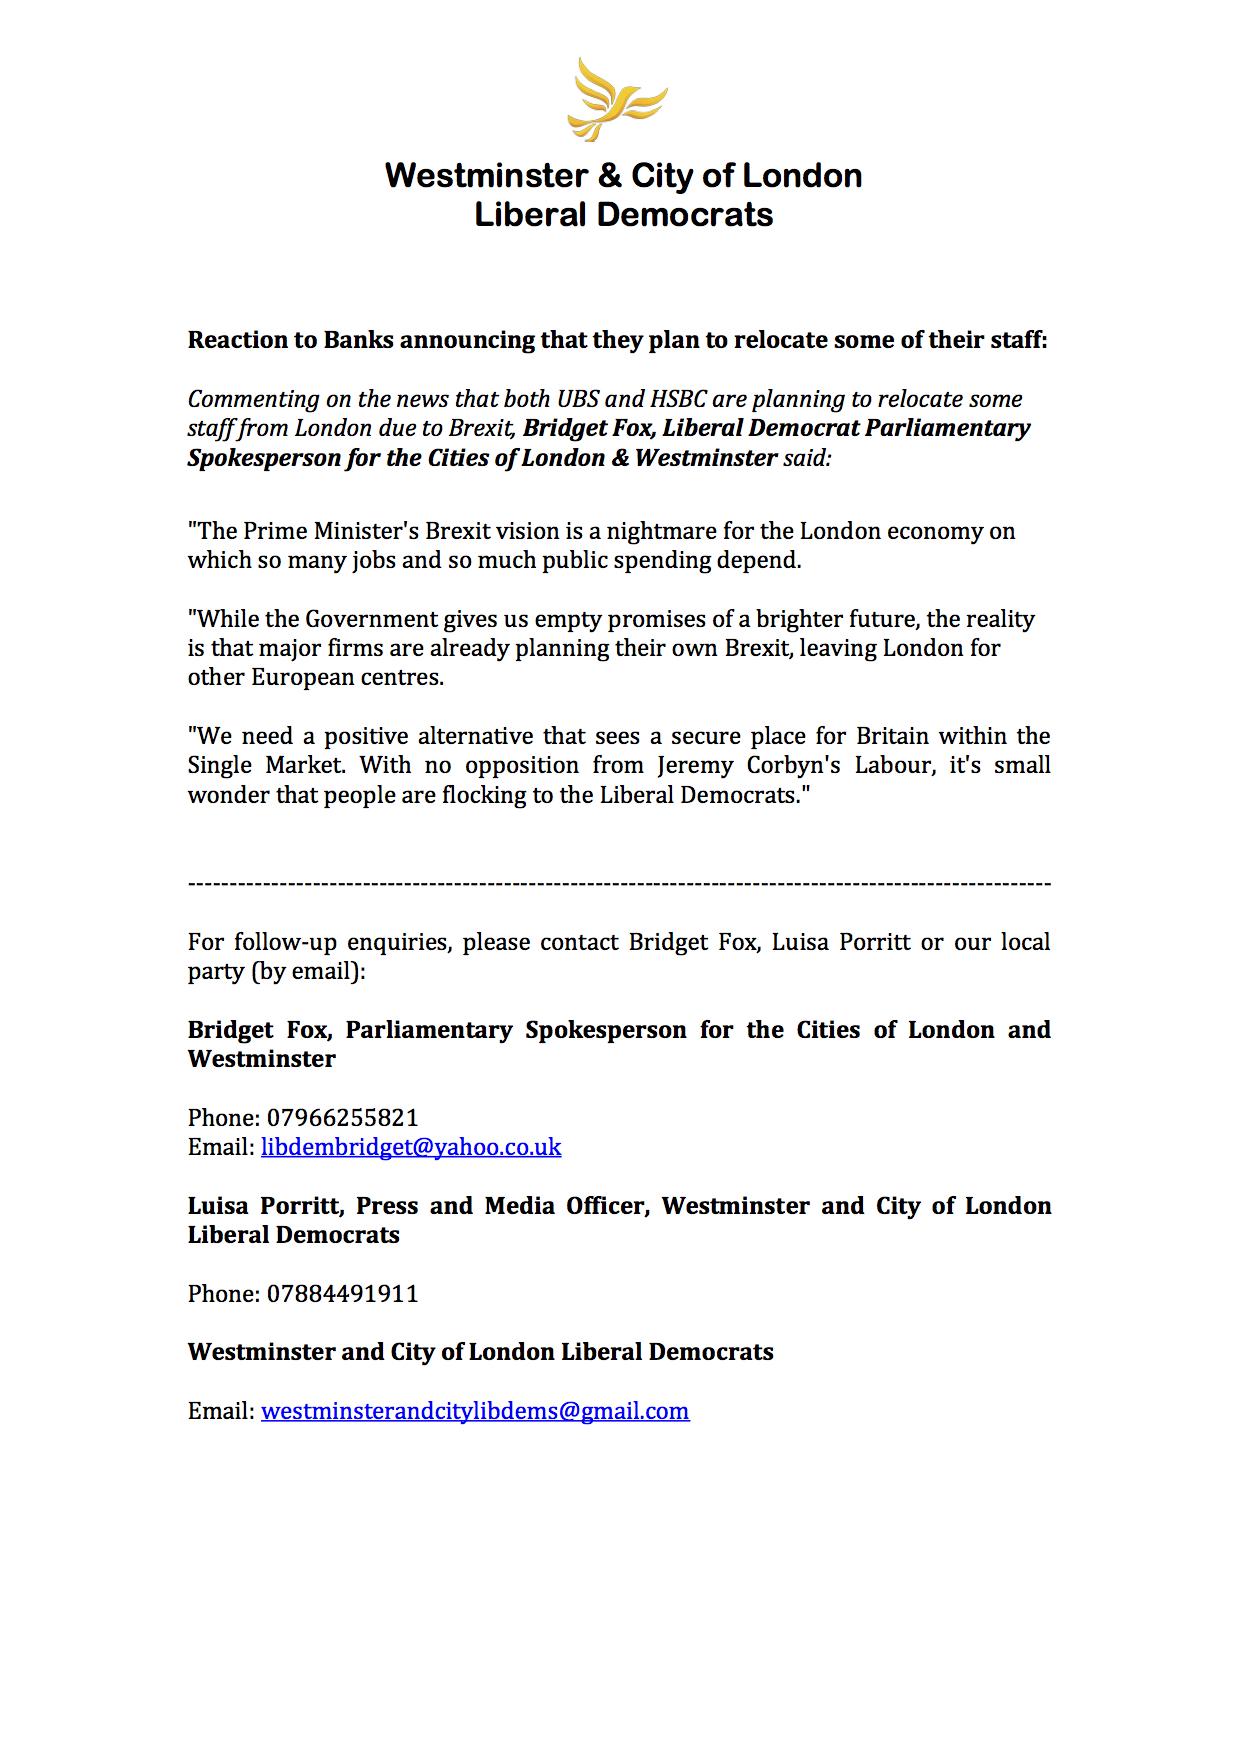 Reaction_to_banks_leaving_London_20.01.17.jpg